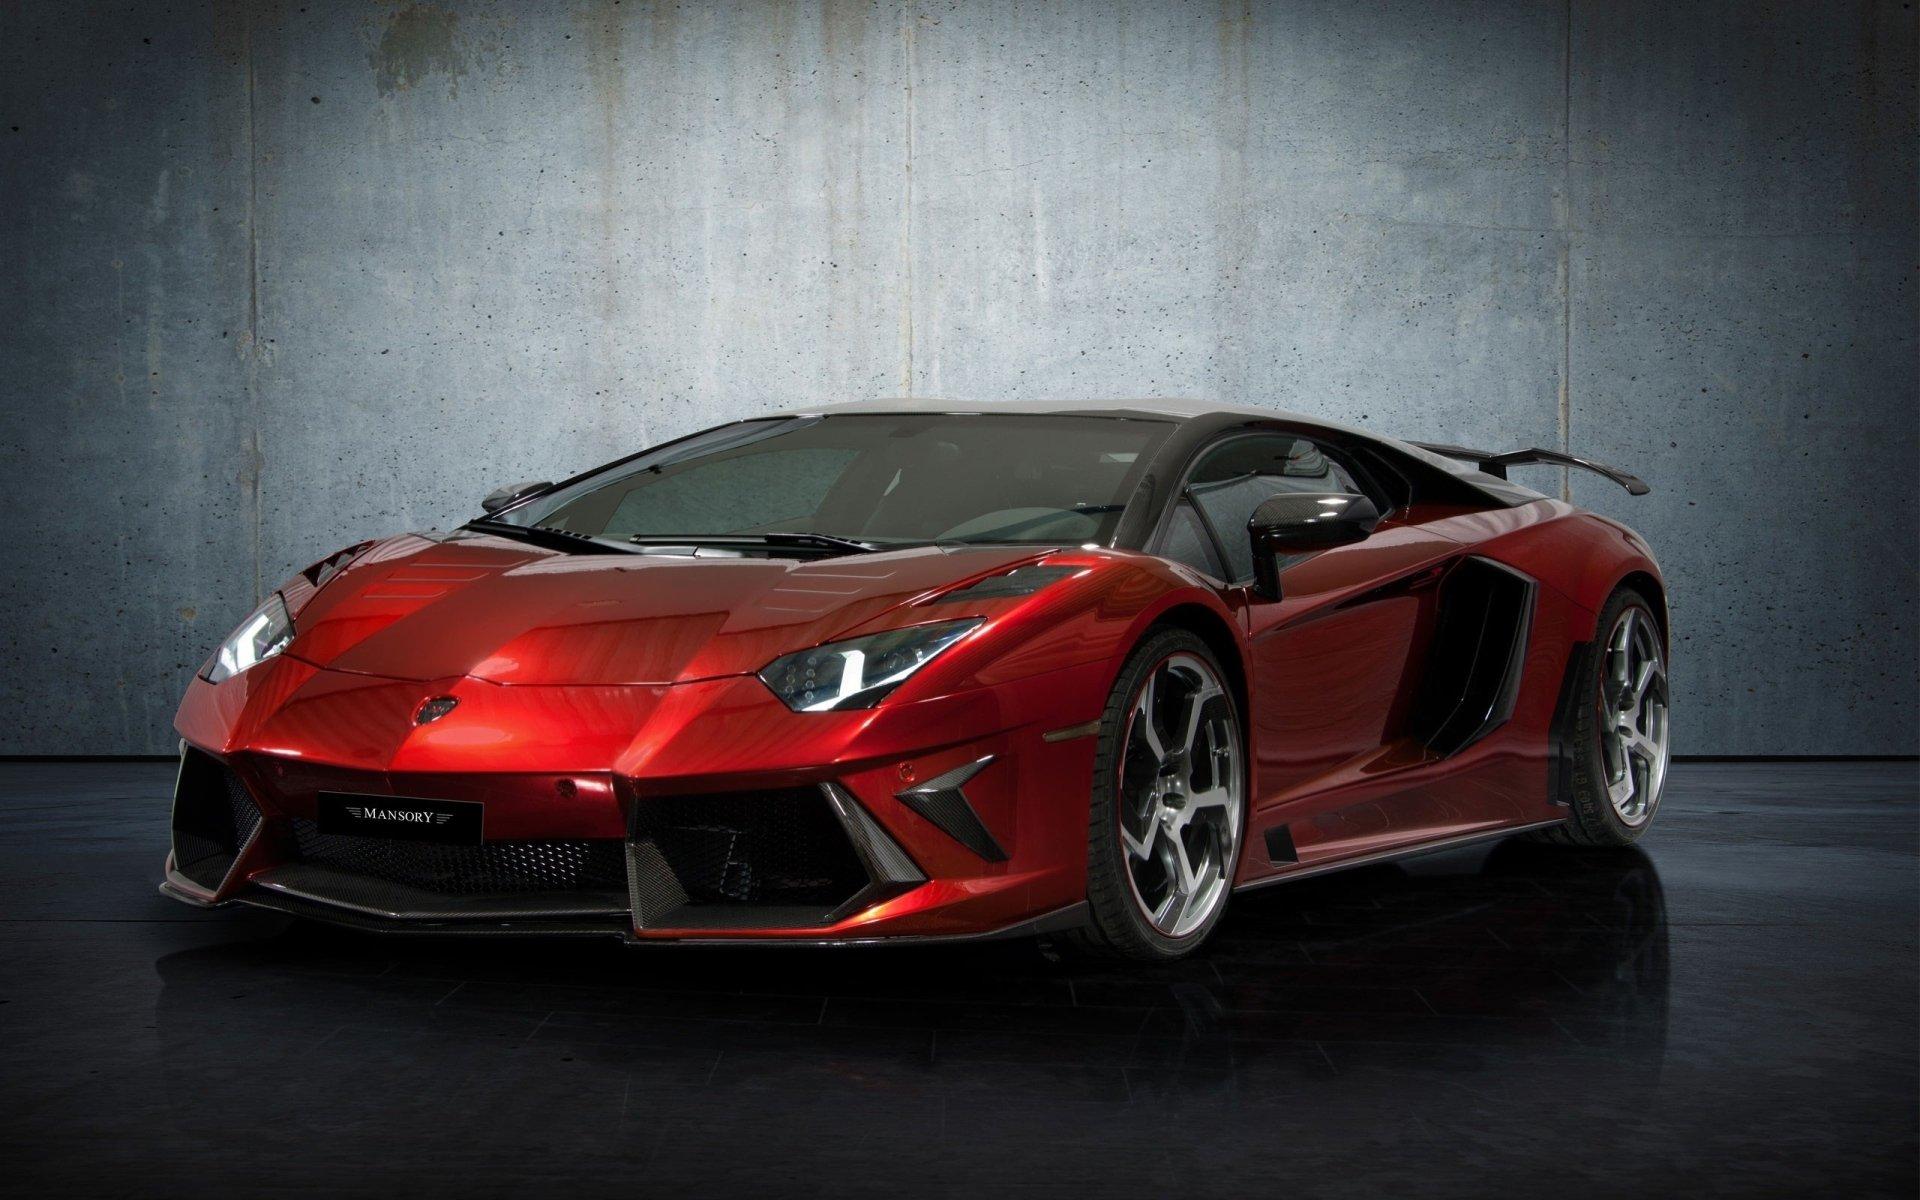 Lamborghini Aventador Mansory Full HD Fond d'écran and Arrière-Plan | 2560x1600 | ID:377390